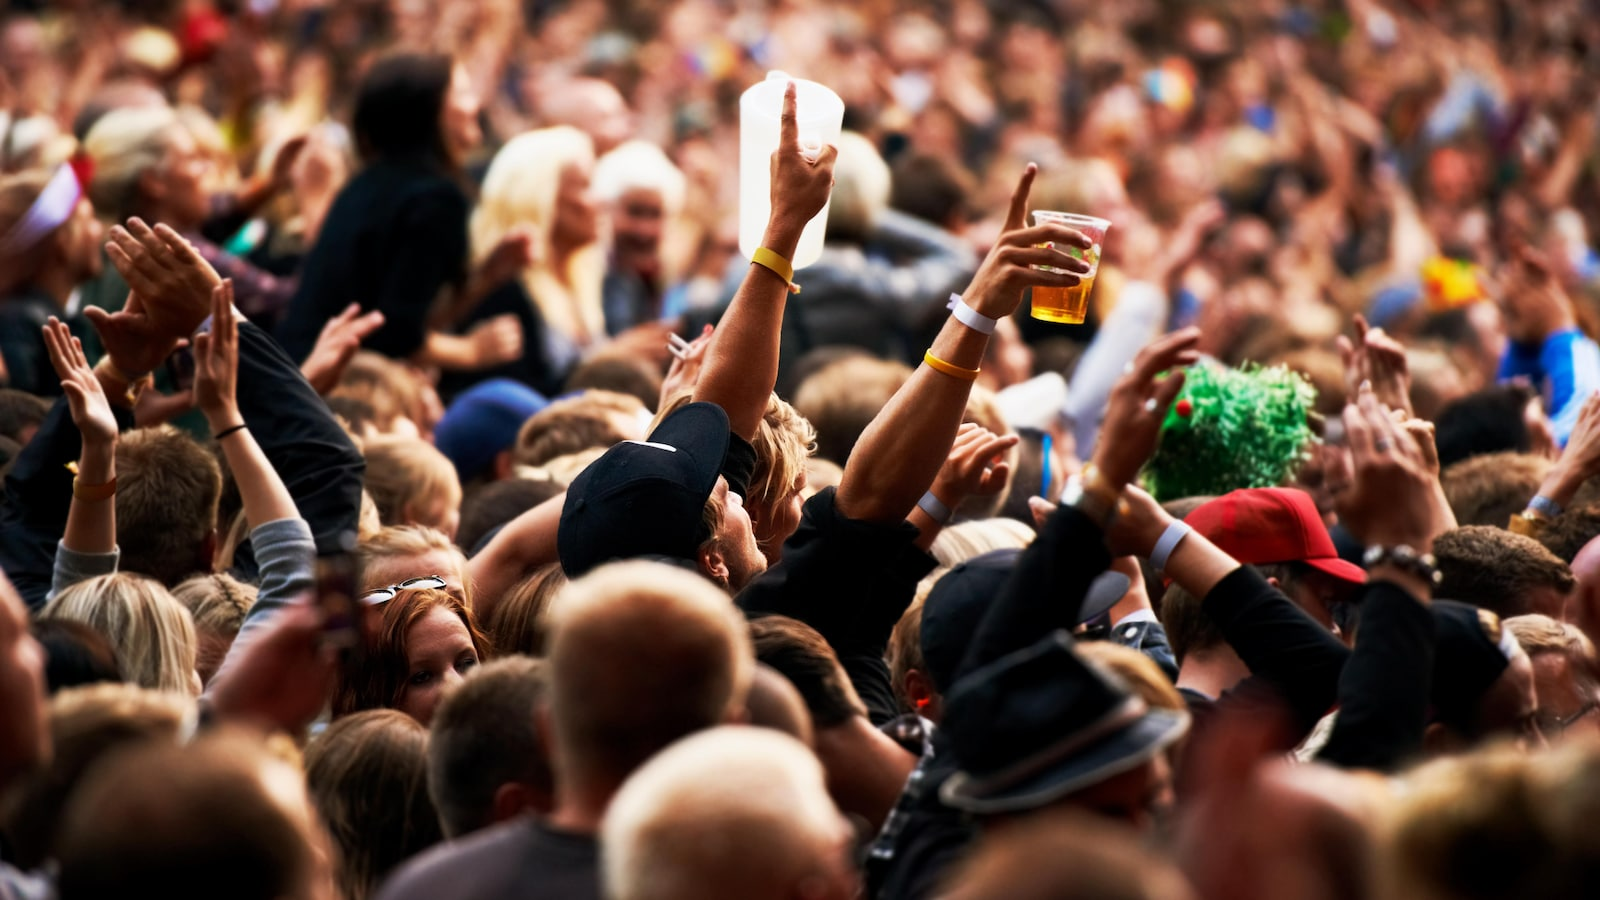 Une foule de festivaliers